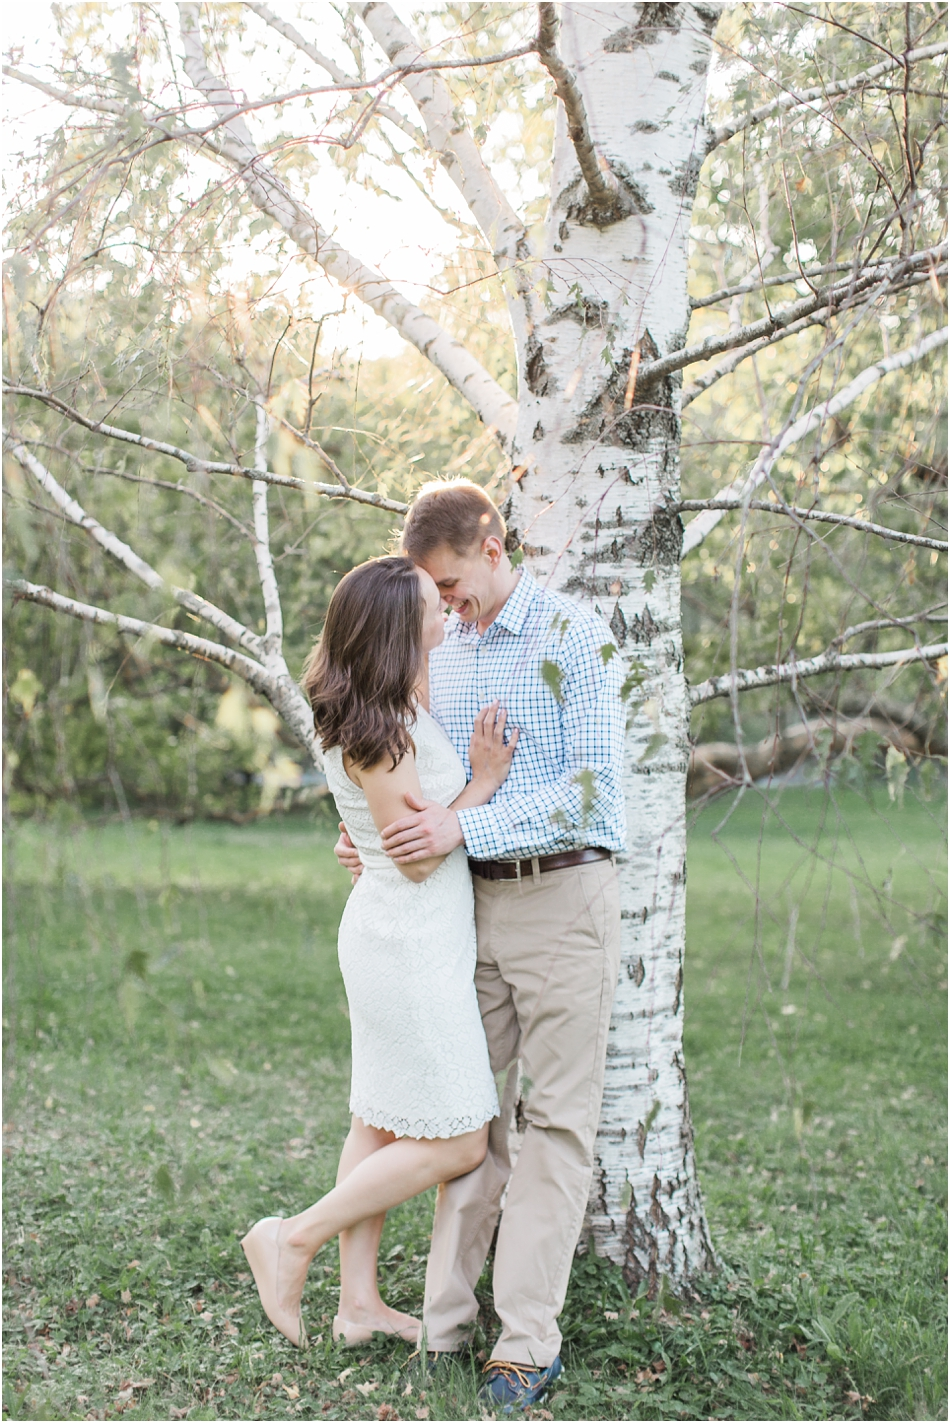 arnold_arboretum_engagement_dylan_mariana_cape_cod_boston_new_england_wedding_photographer_Meredith_Jane_Photography_photo_2662.jpg